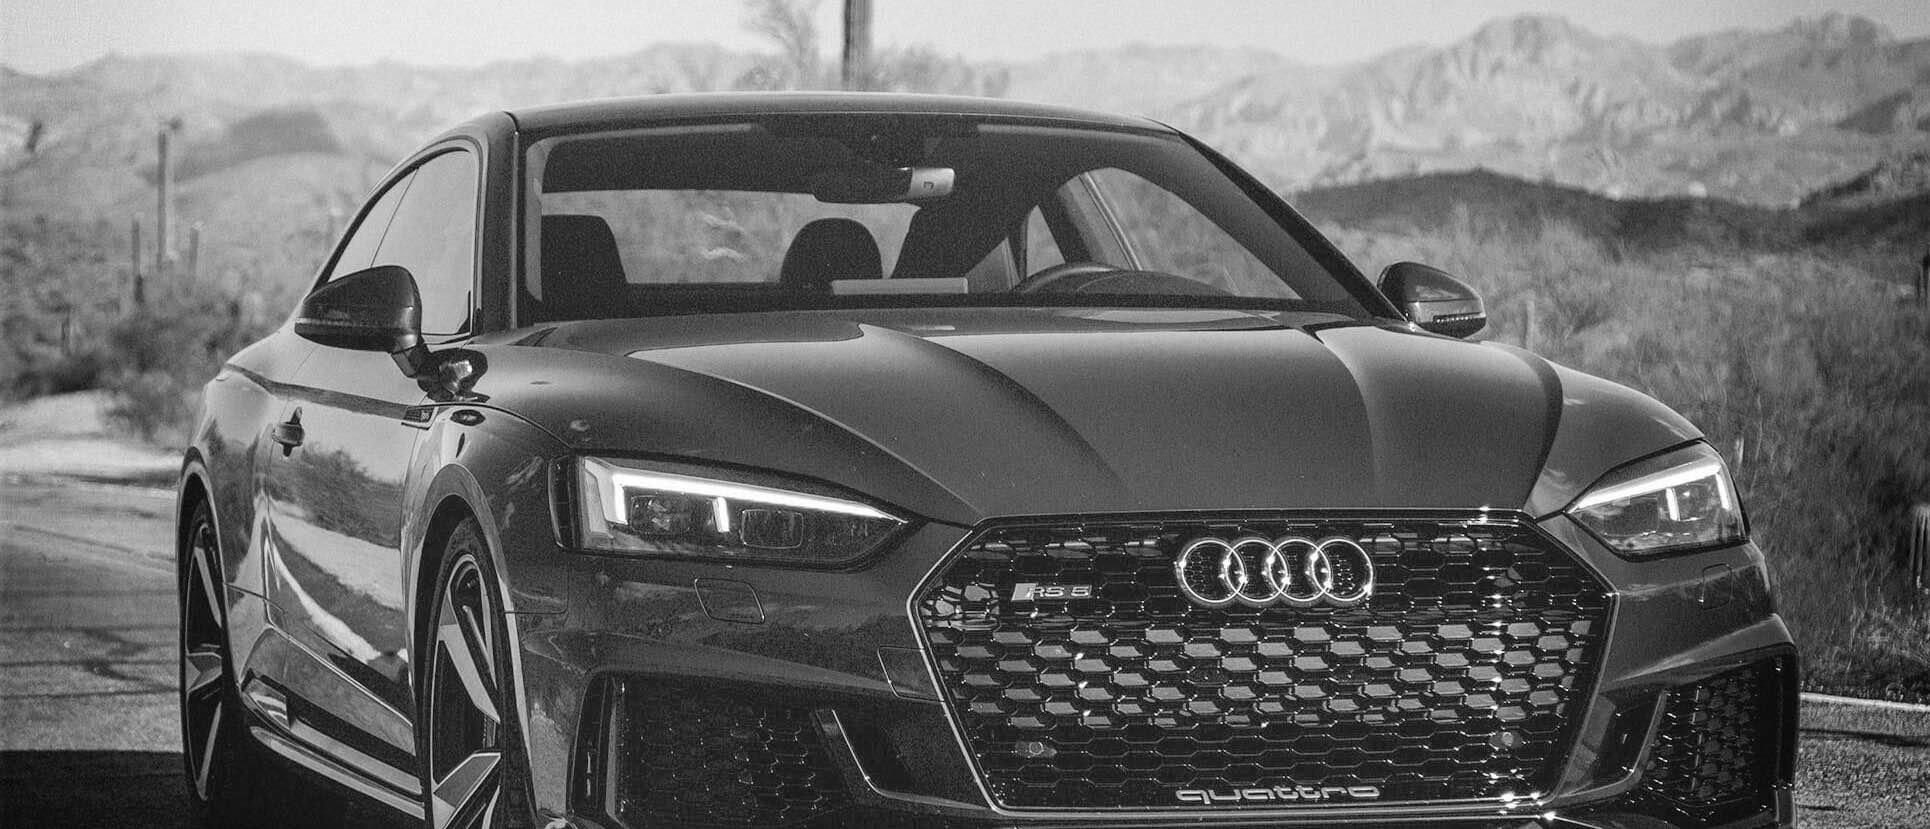 Complete-Audi-Buying-Guide-gear-patrol-lead-full_Fotor-1